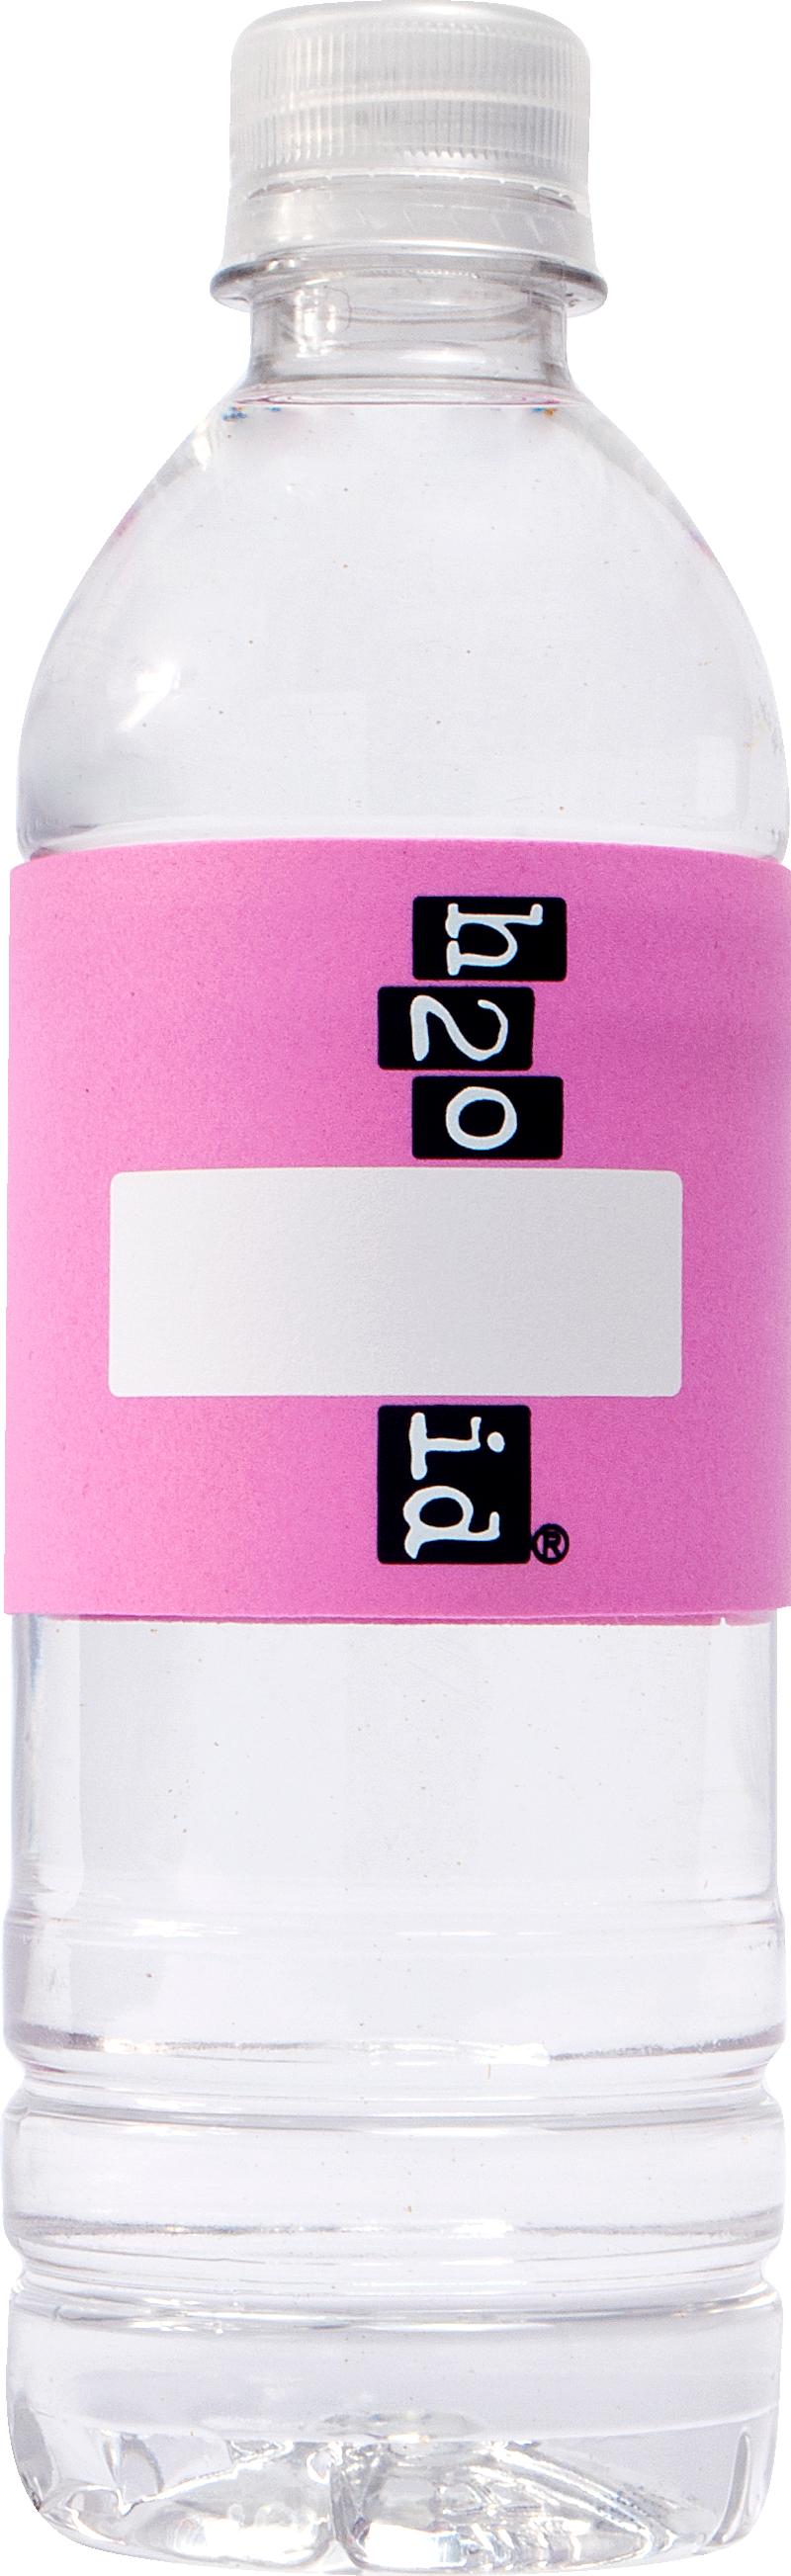 pinkbottle